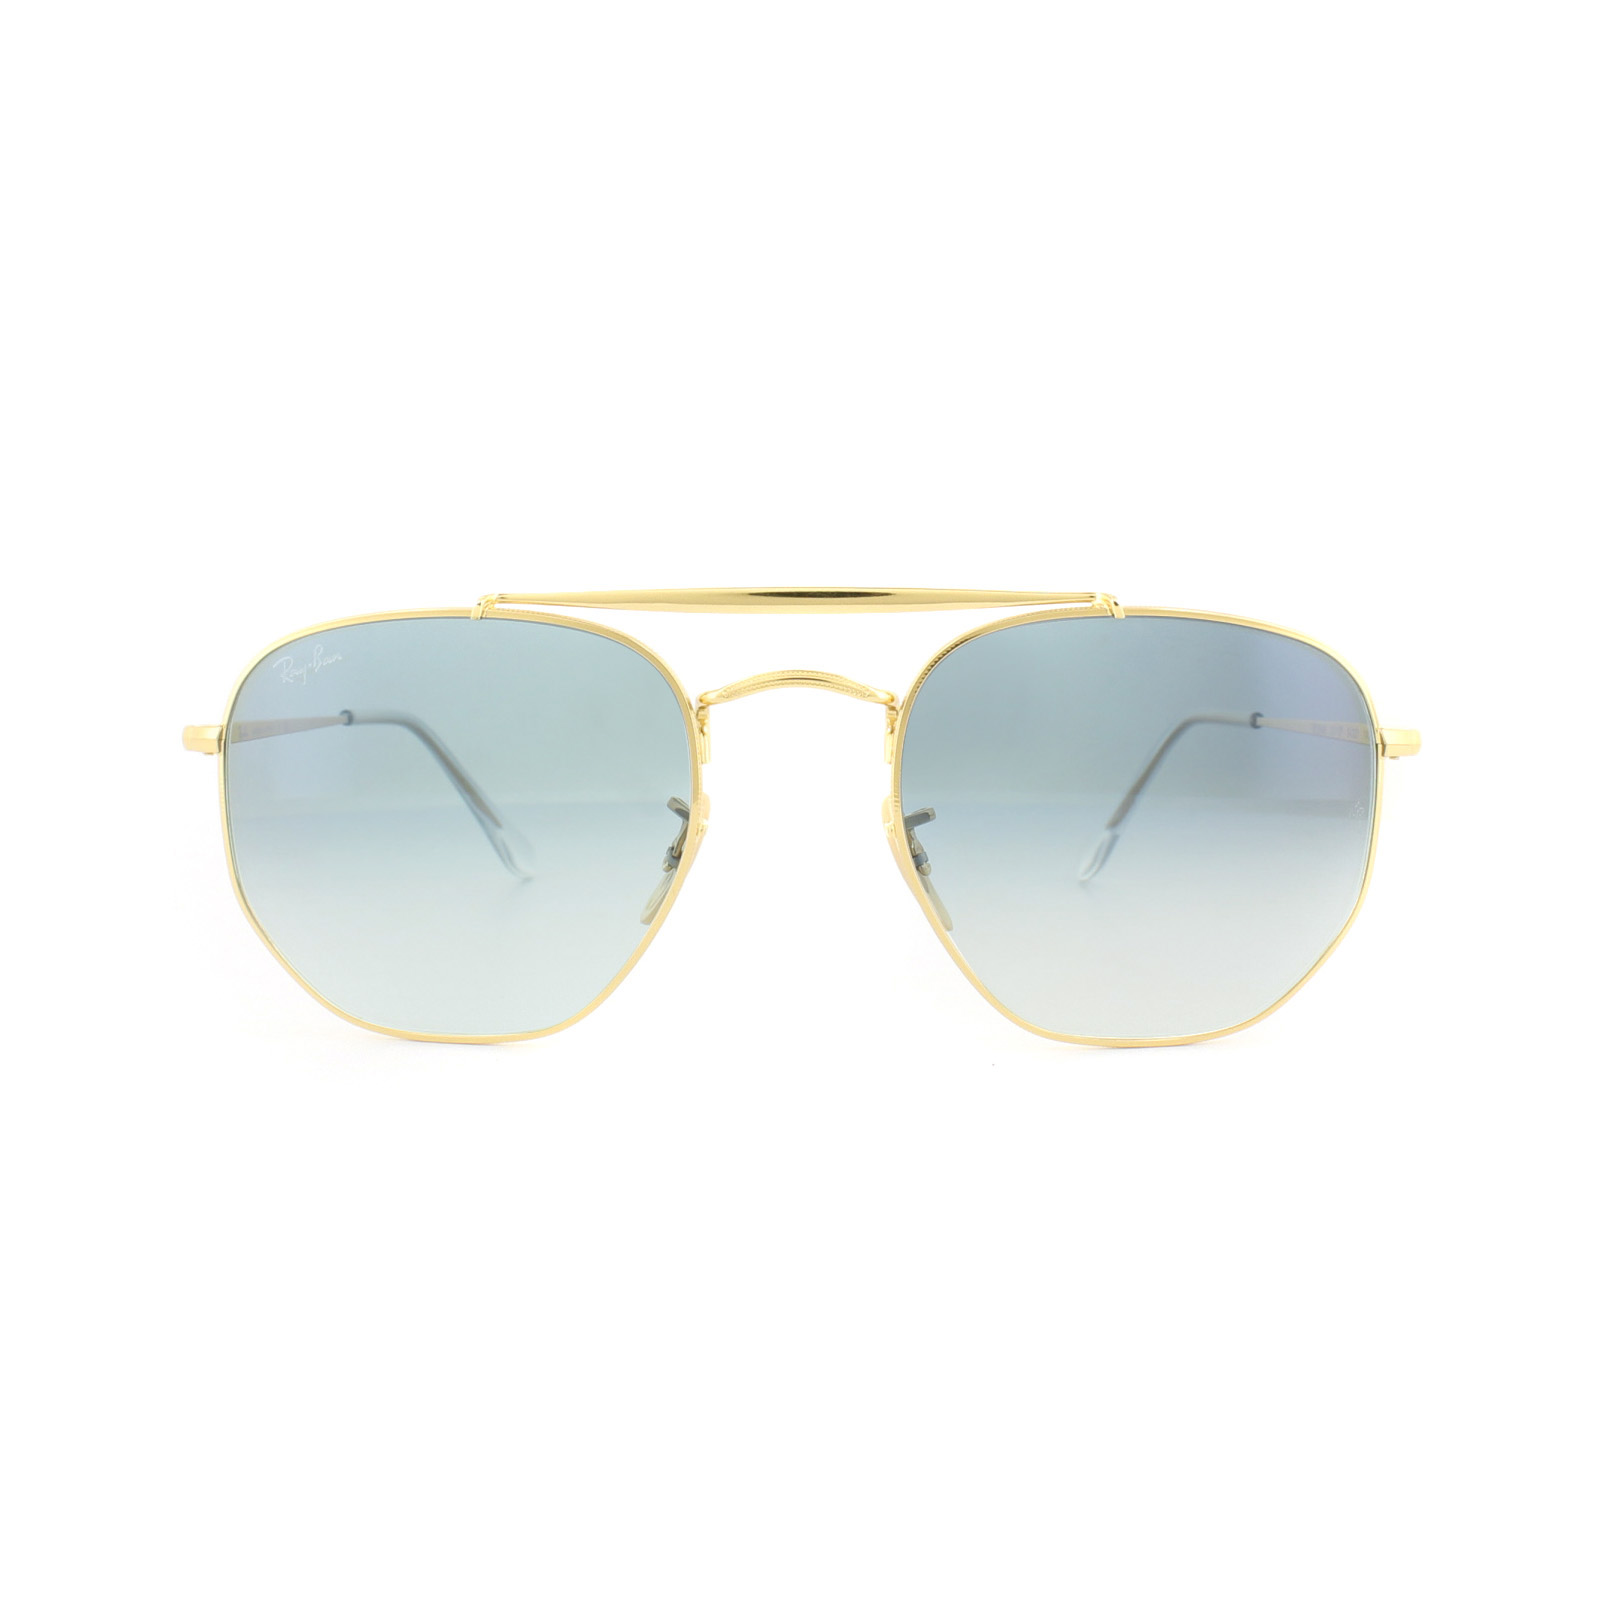 58c3c5ed41dc9 Cheap Ray-Ban Marshal 3648 Sunglasses - Discounted Sunglasses